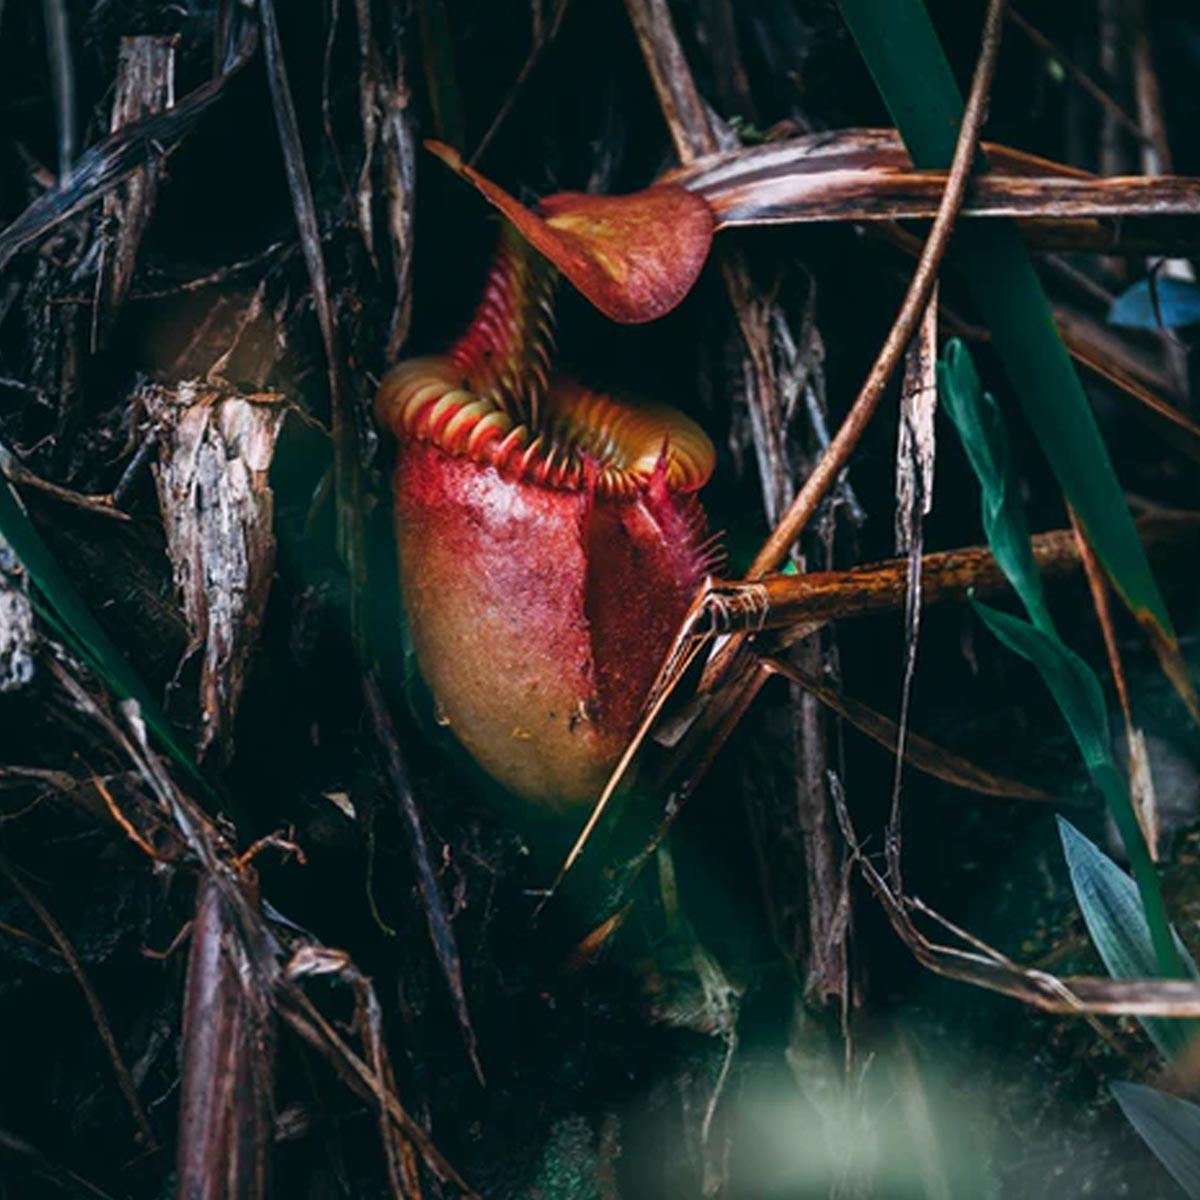 Plantas carnívoras ornamentales para tu jardín - Nepenthes bicalcaratan